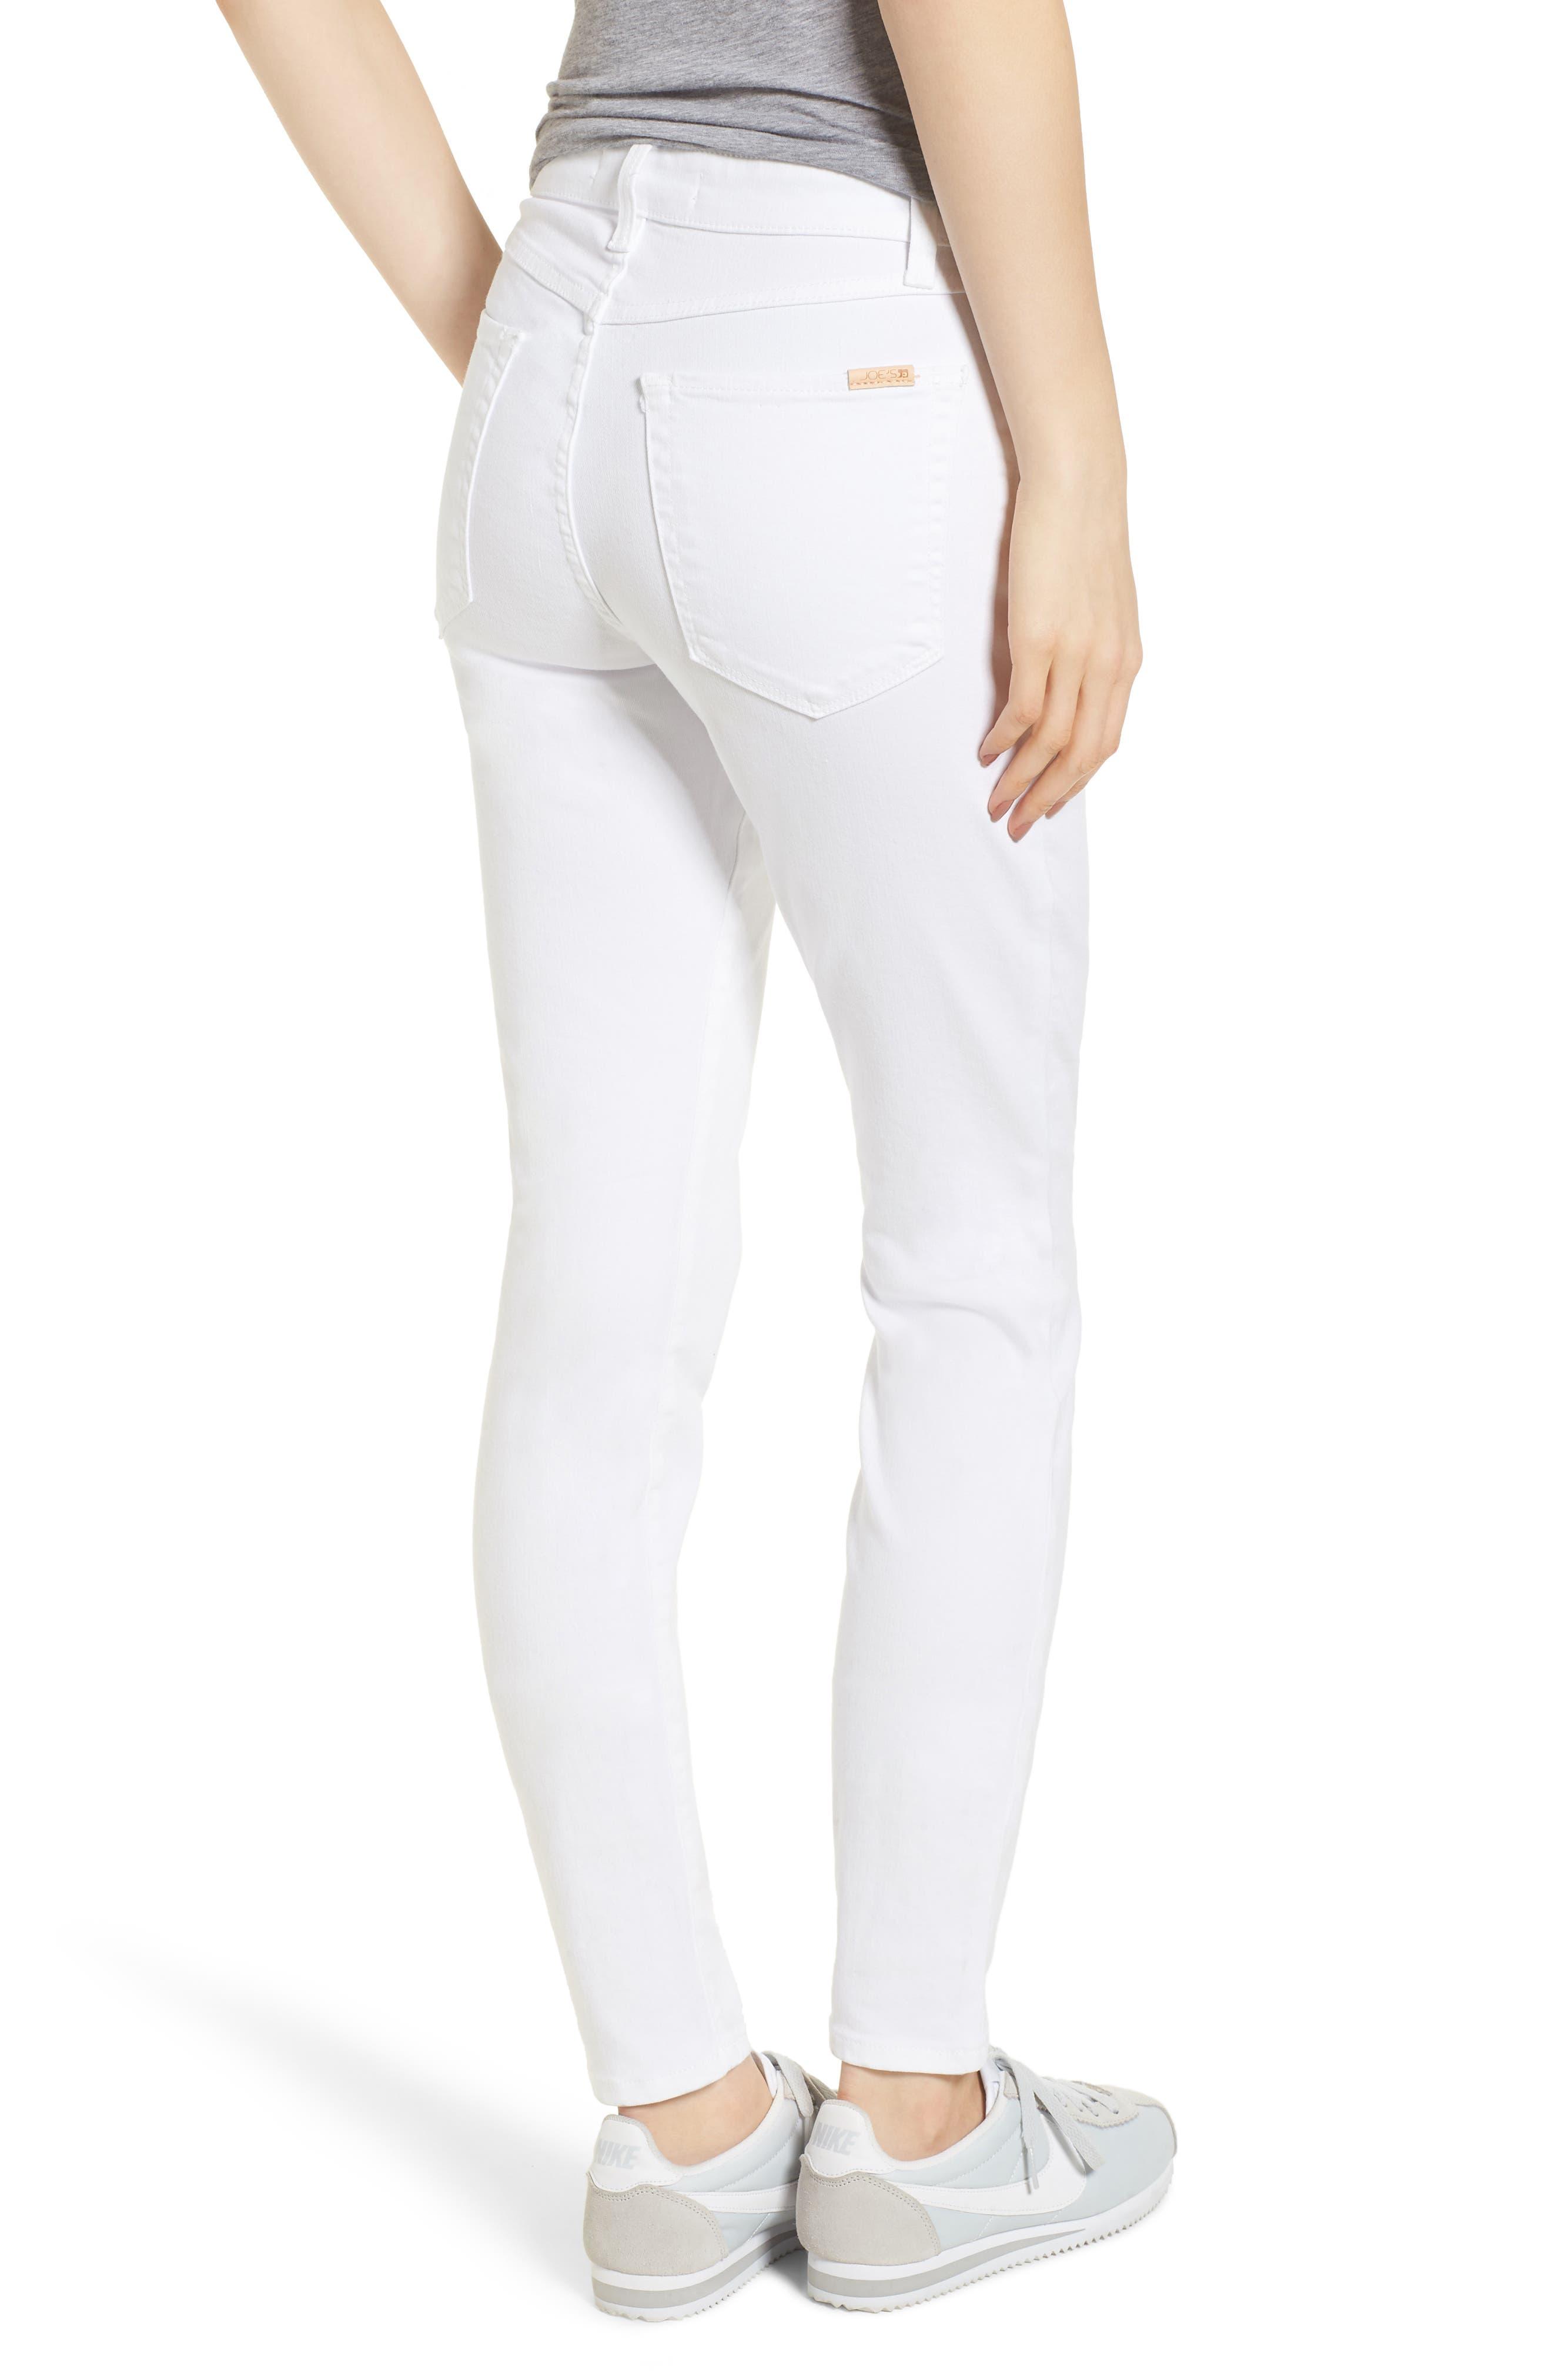 Charlie Skinny Jeans,                             Alternate thumbnail 2, color,                             120